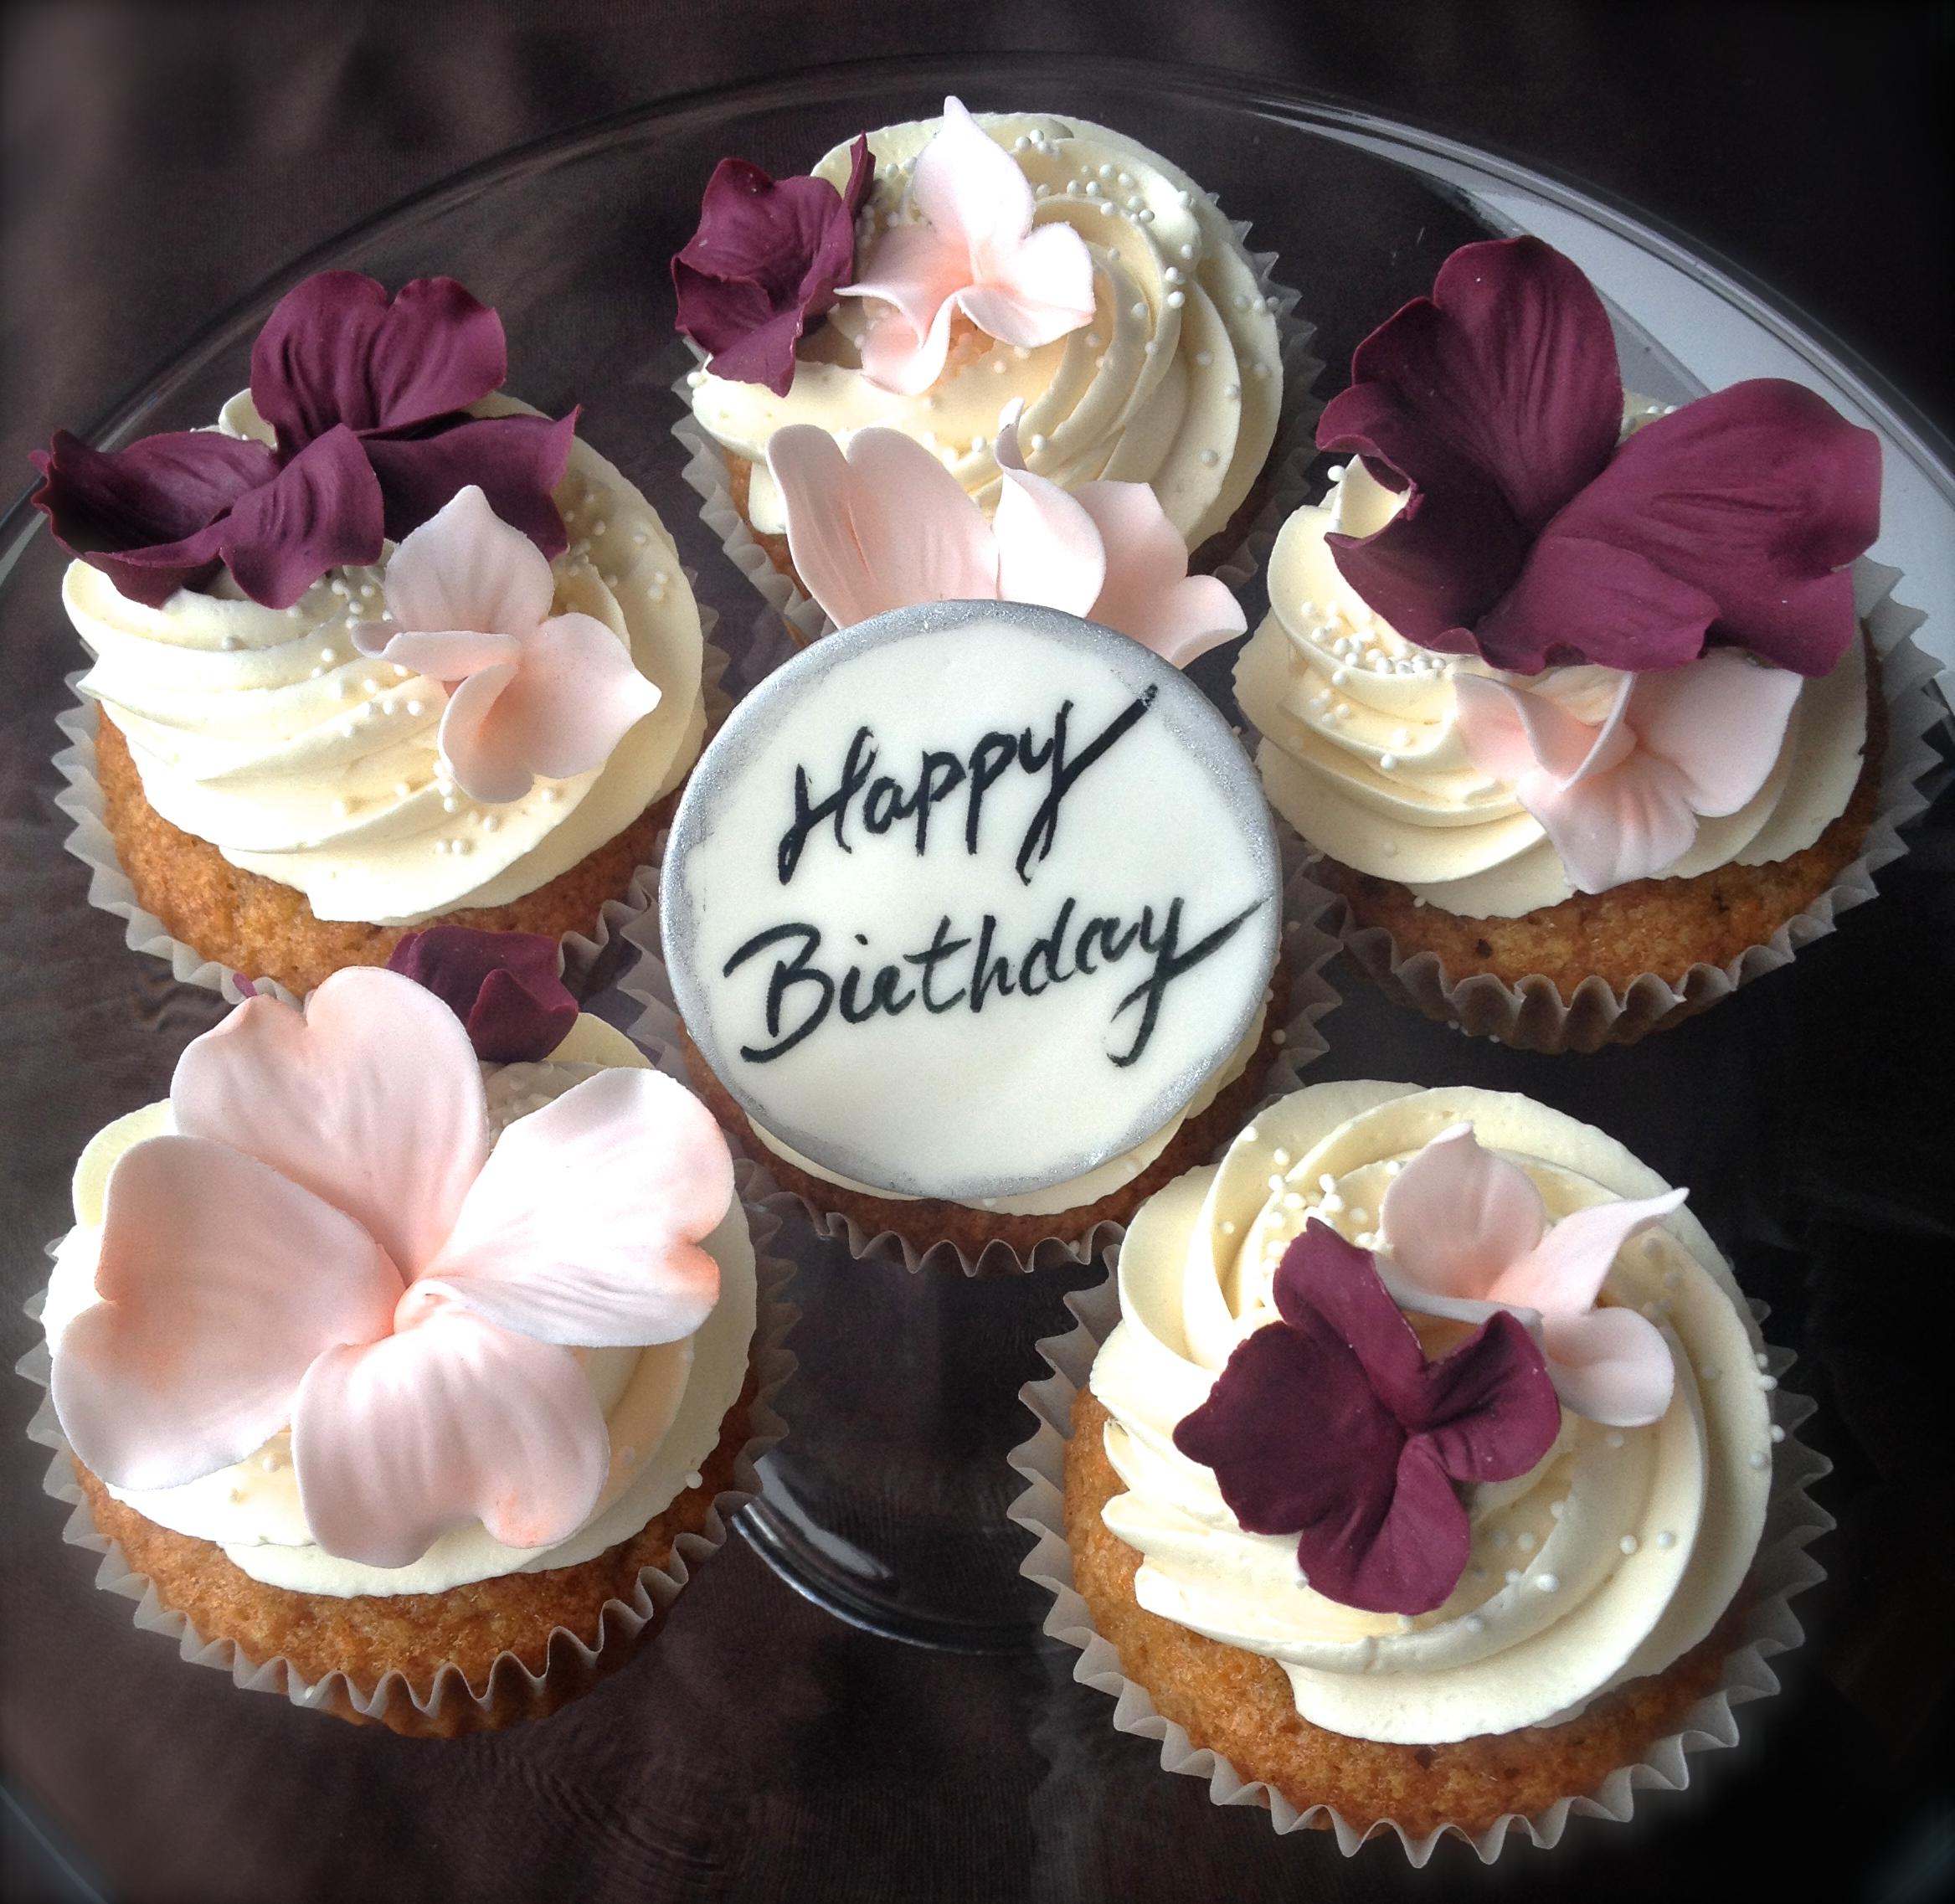 Carrot cupcakes & cream cheese